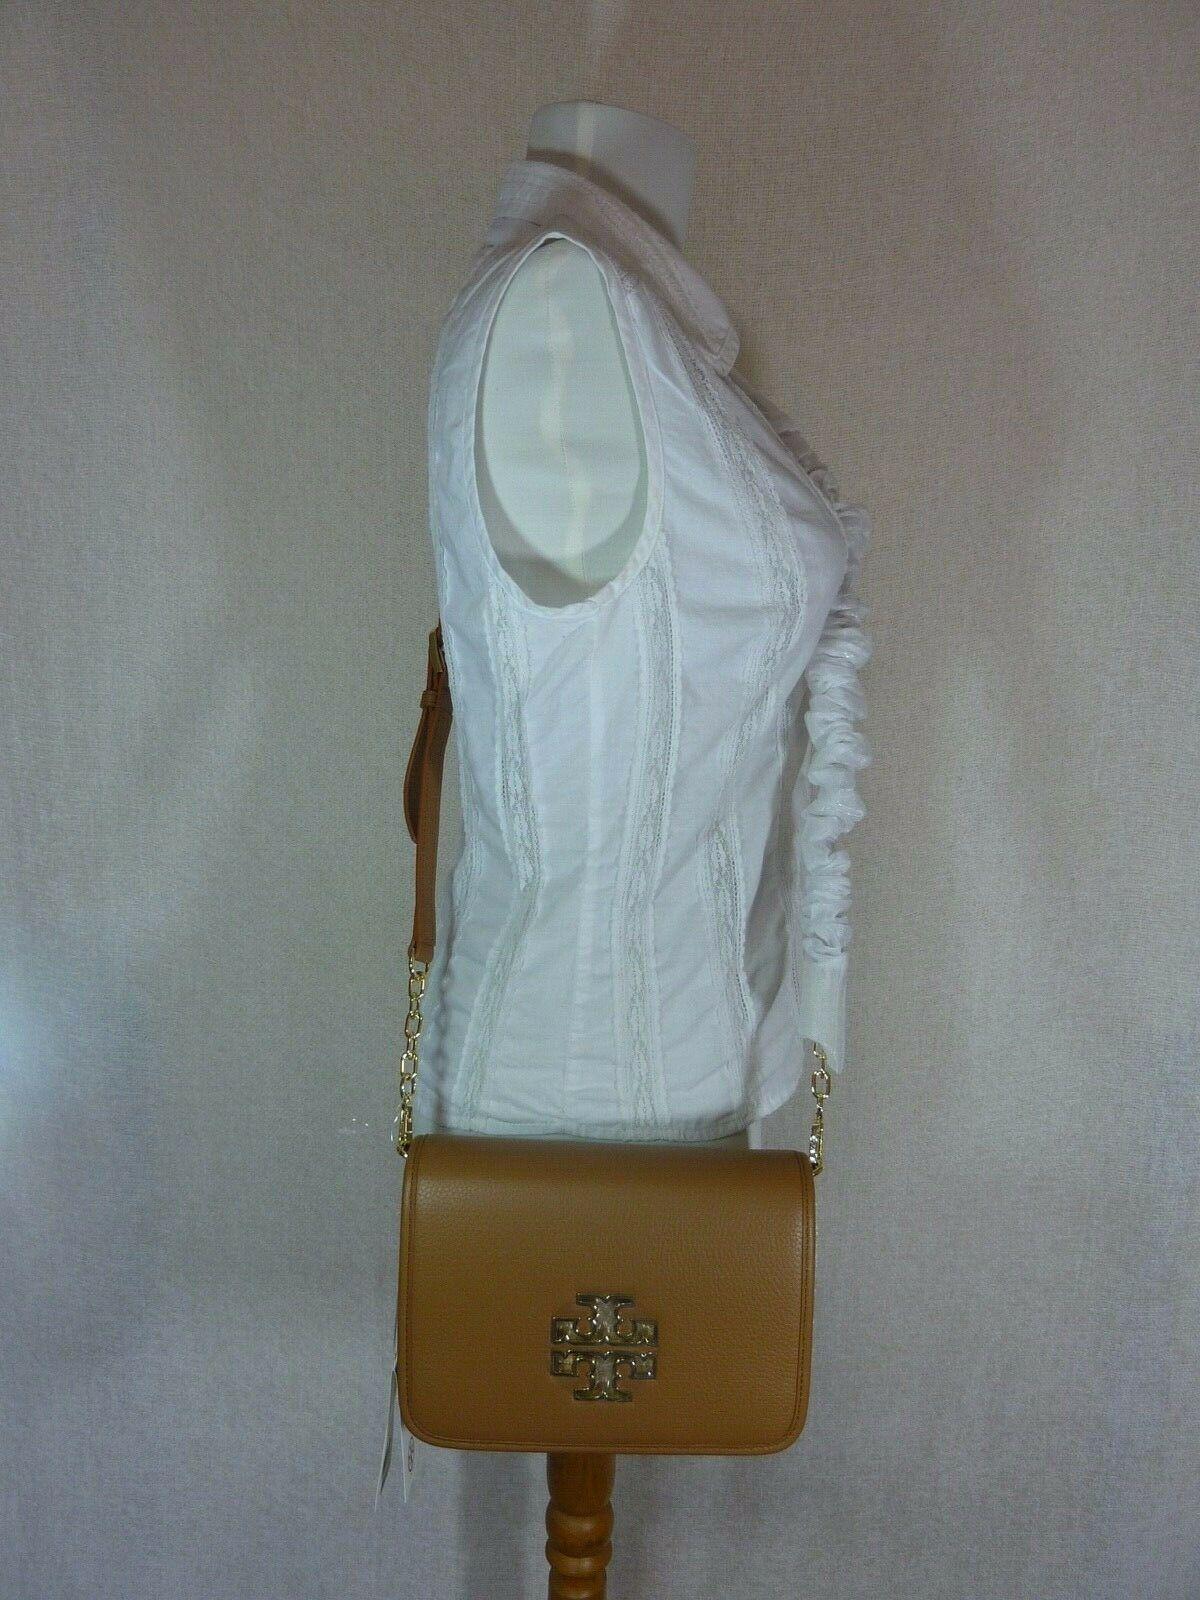 NWT Tory Burch Bark Leather Britten Combo Cross Body bag/Clutch  - $425 image 9